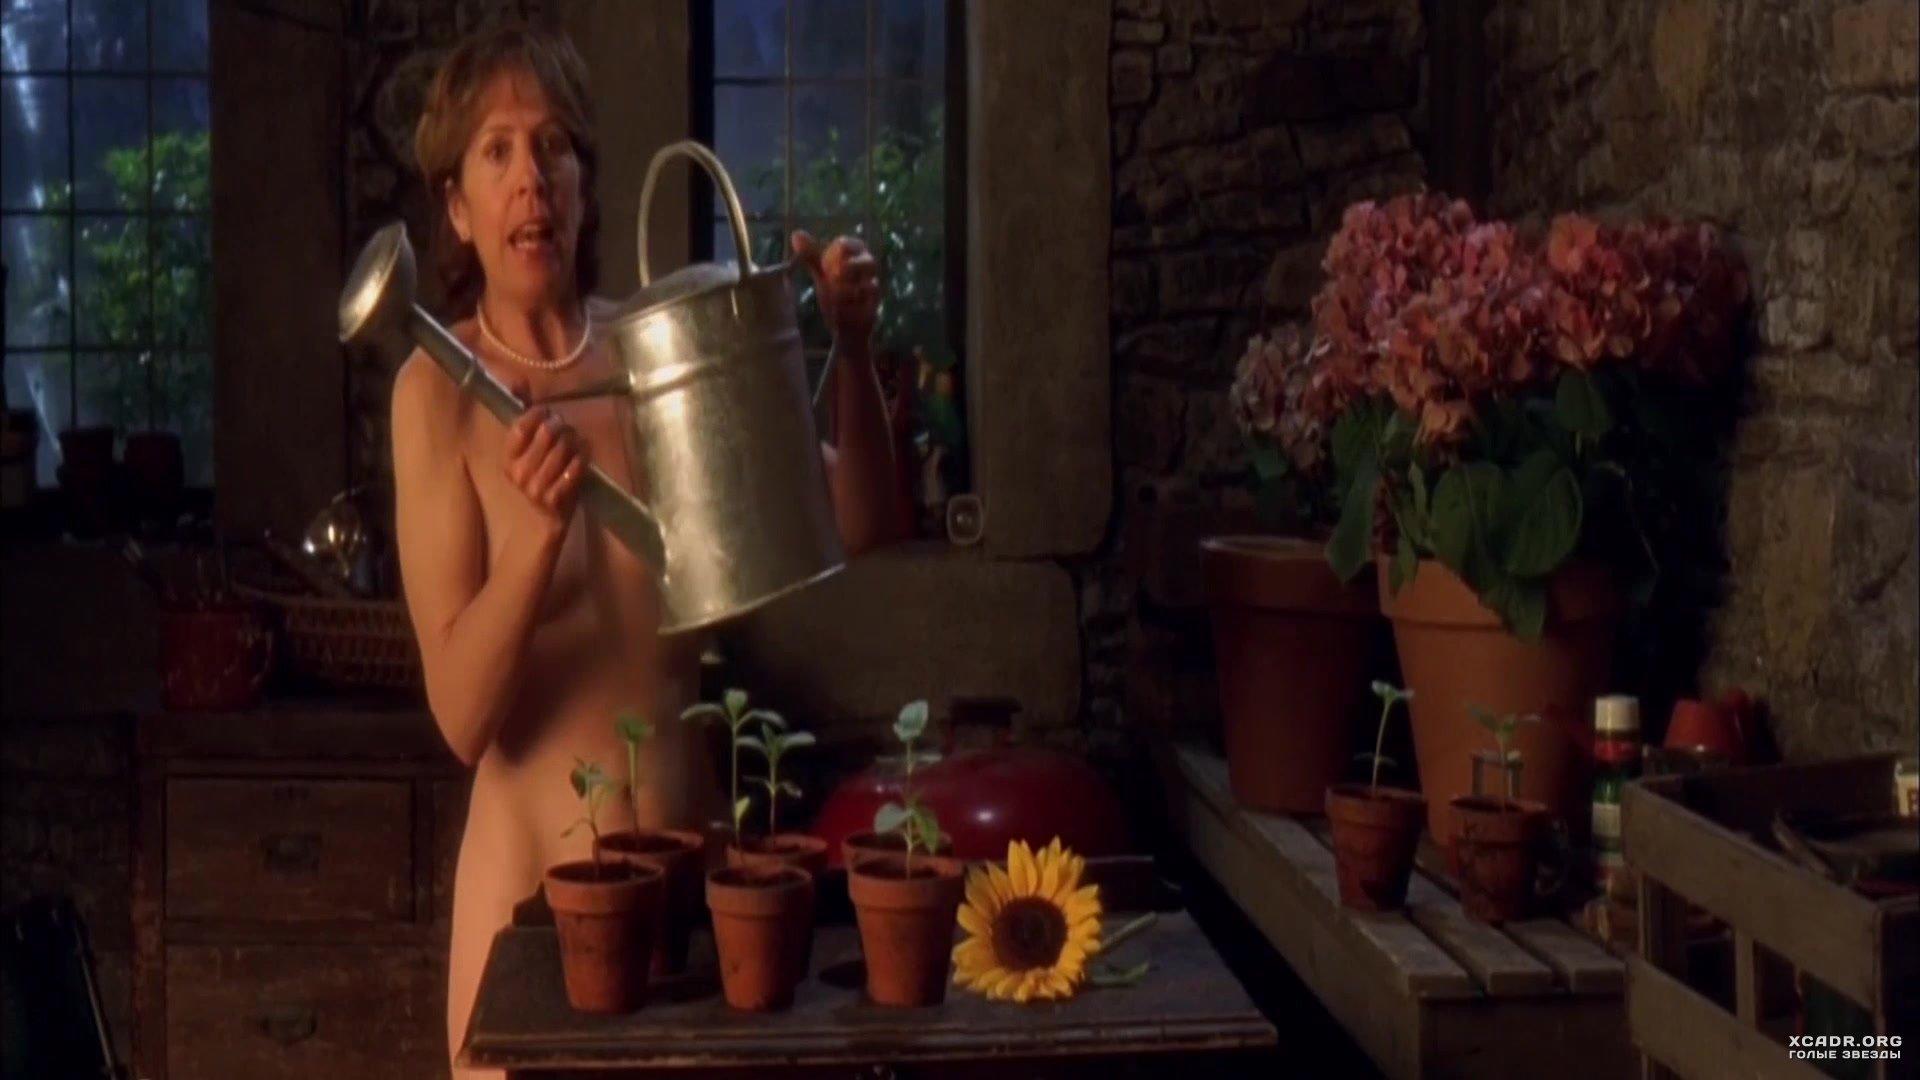 Naked Celia Imrie In Wokenwell Ancensored